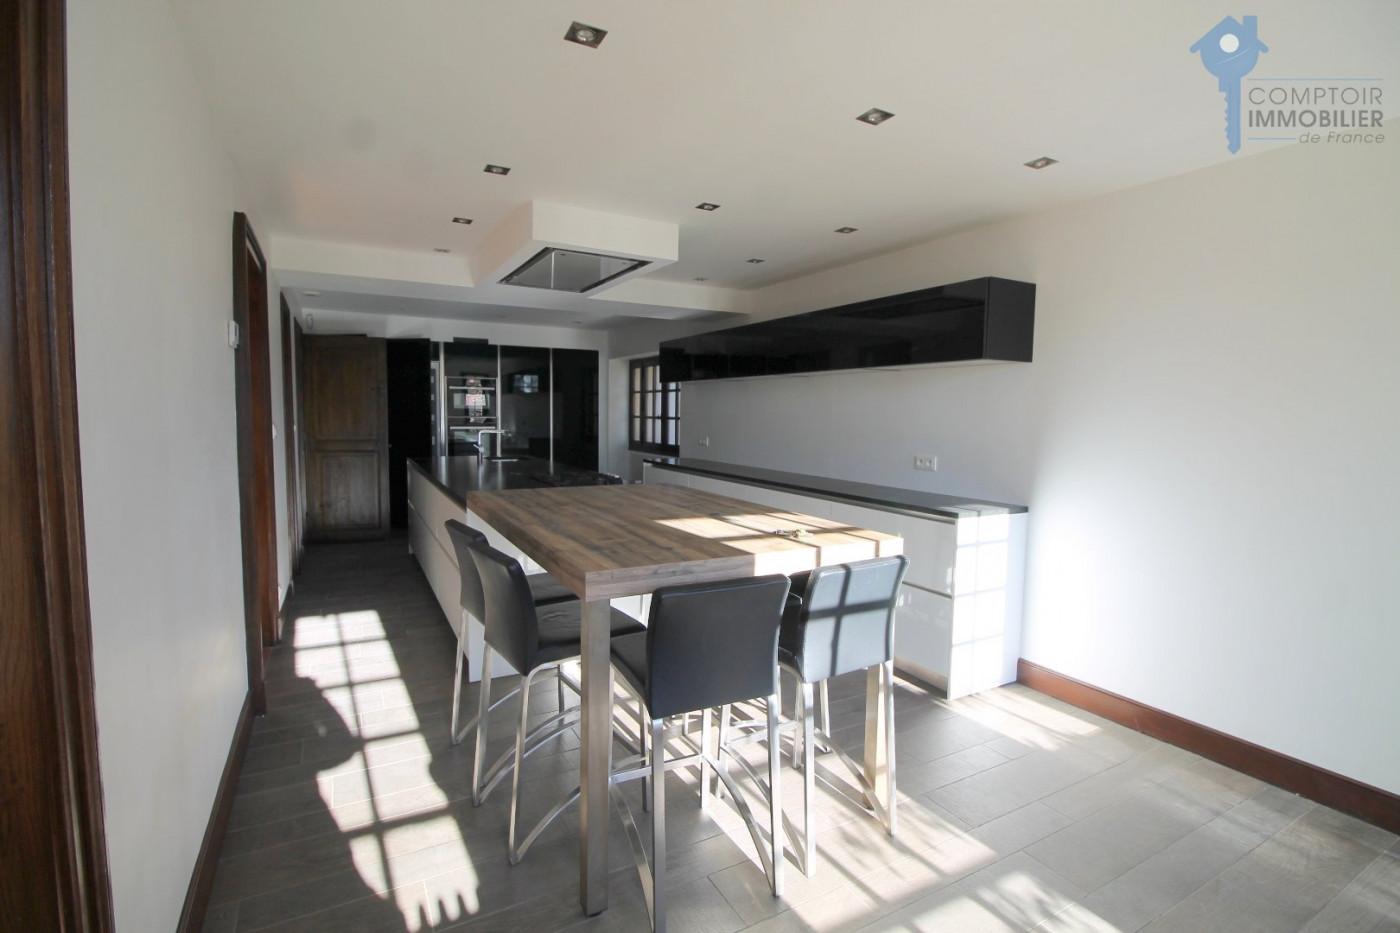 A vendre Breval 3438036619 Comptoir immobilier en normandie